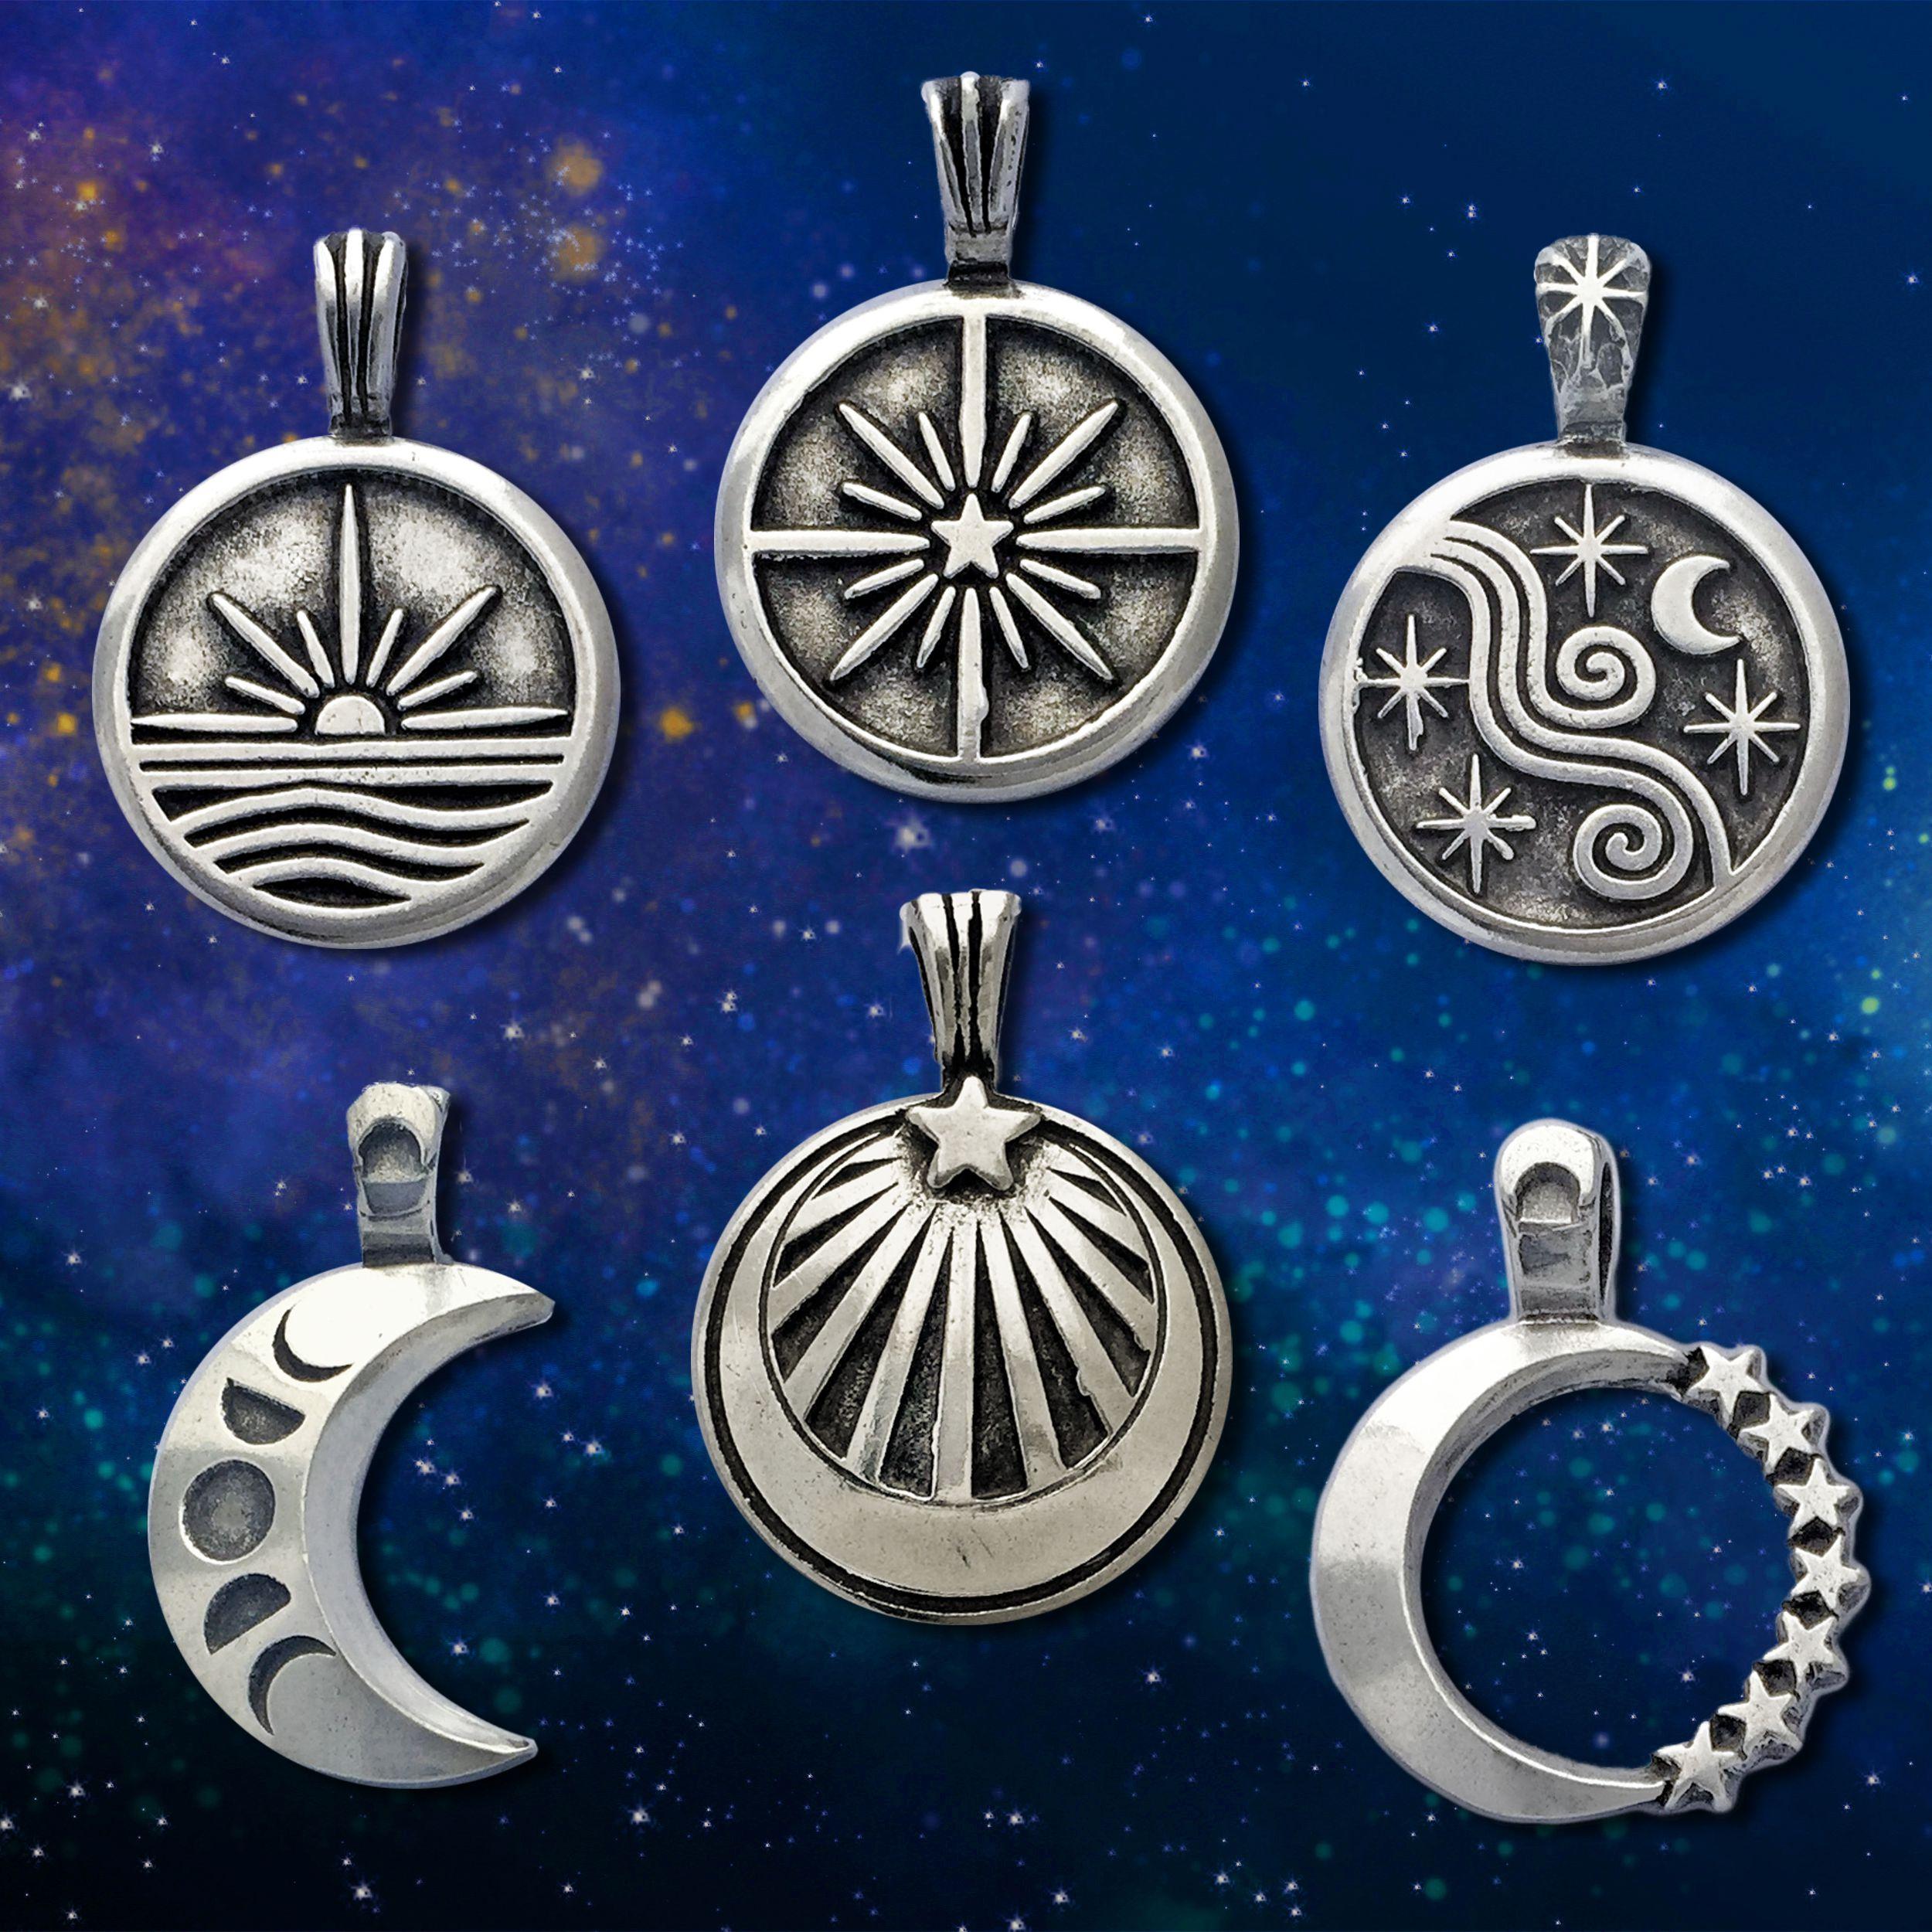 Preferred Sun, Moon and Star Pendants by Deva Designs NJ31